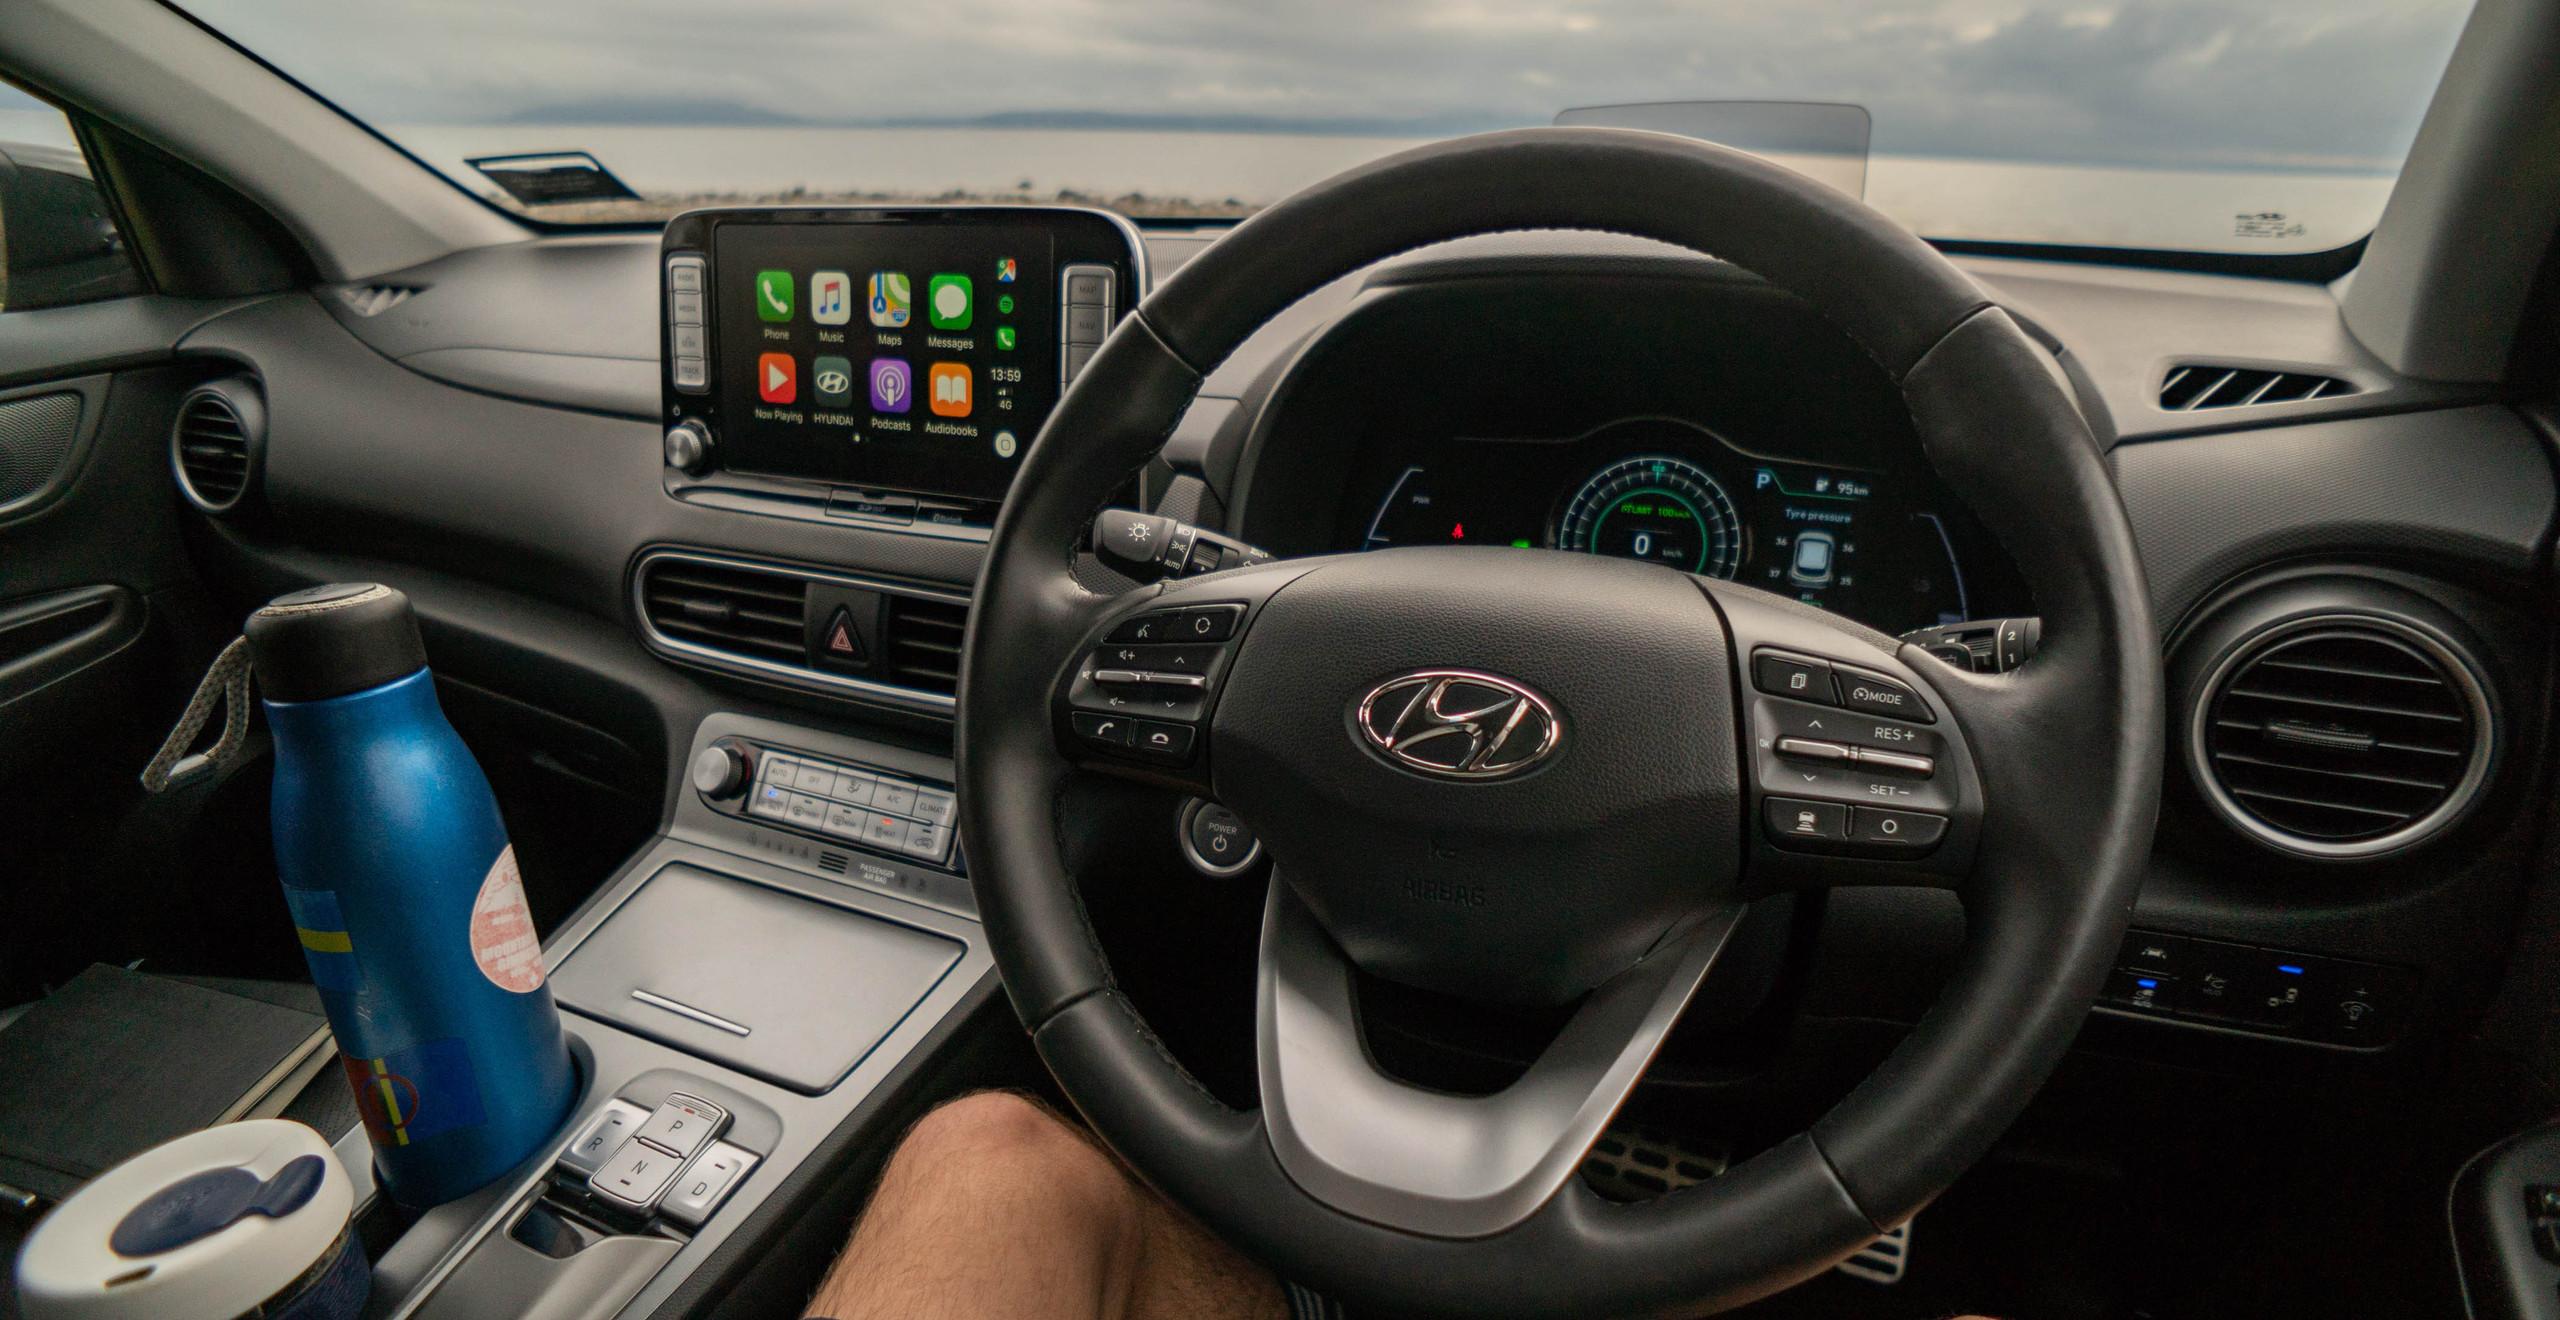 Hyundai Kona Electric 2019 interior steering wheel dashboard Apple CarPlay